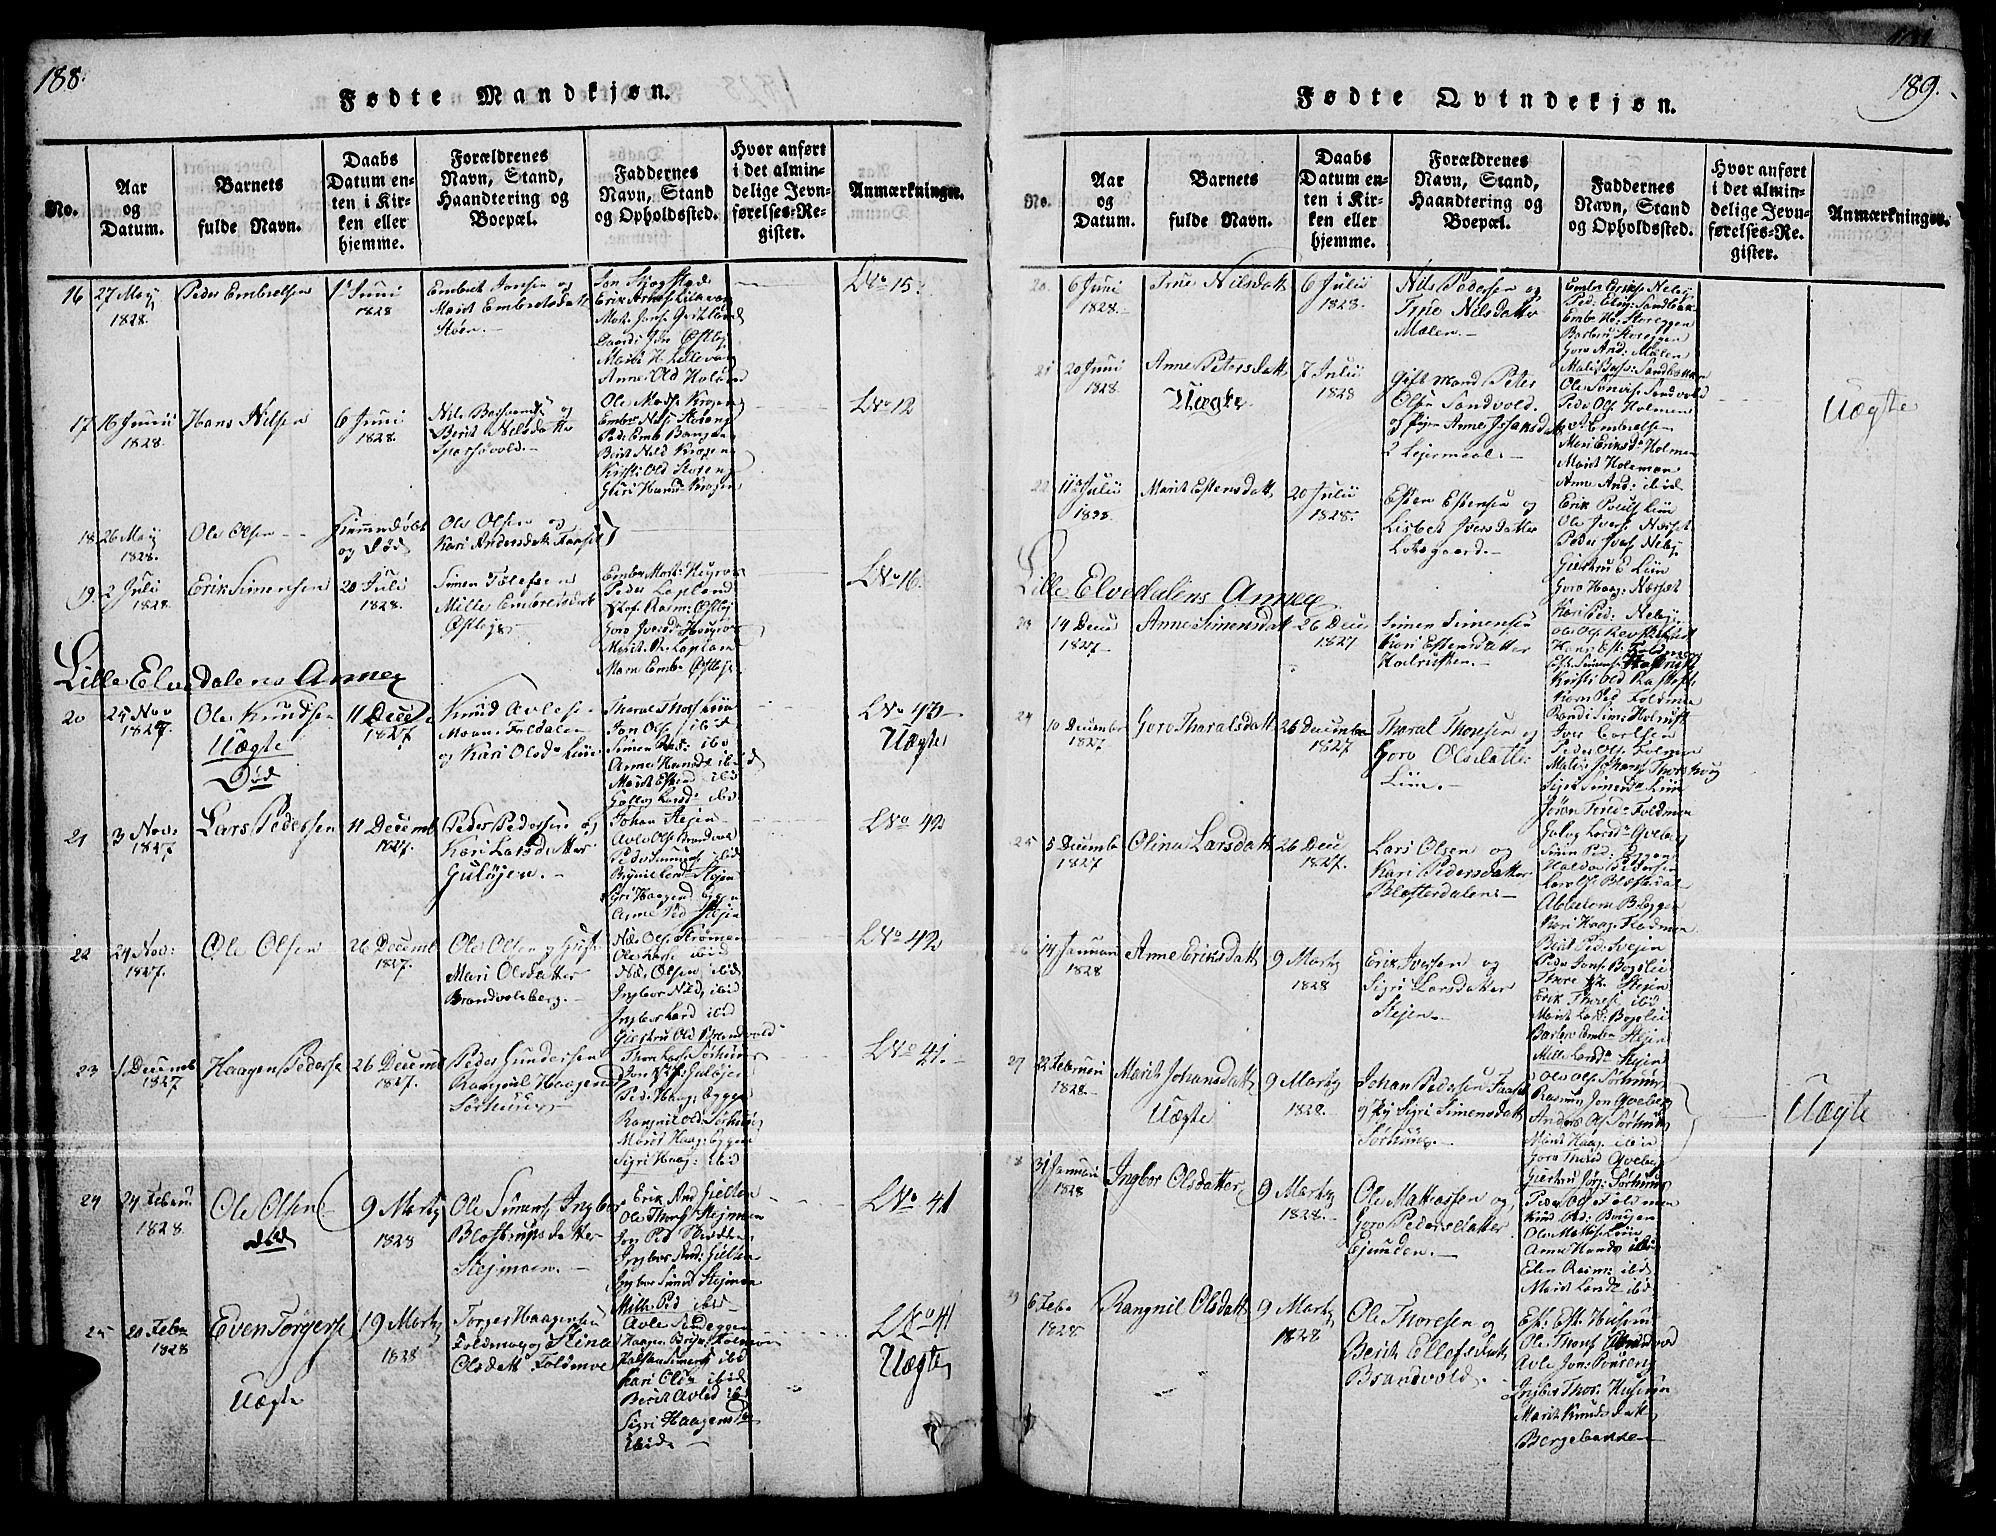 SAH, Tynset prestekontor, Ministerialbok nr. 18, 1815-1829, s. 188-189